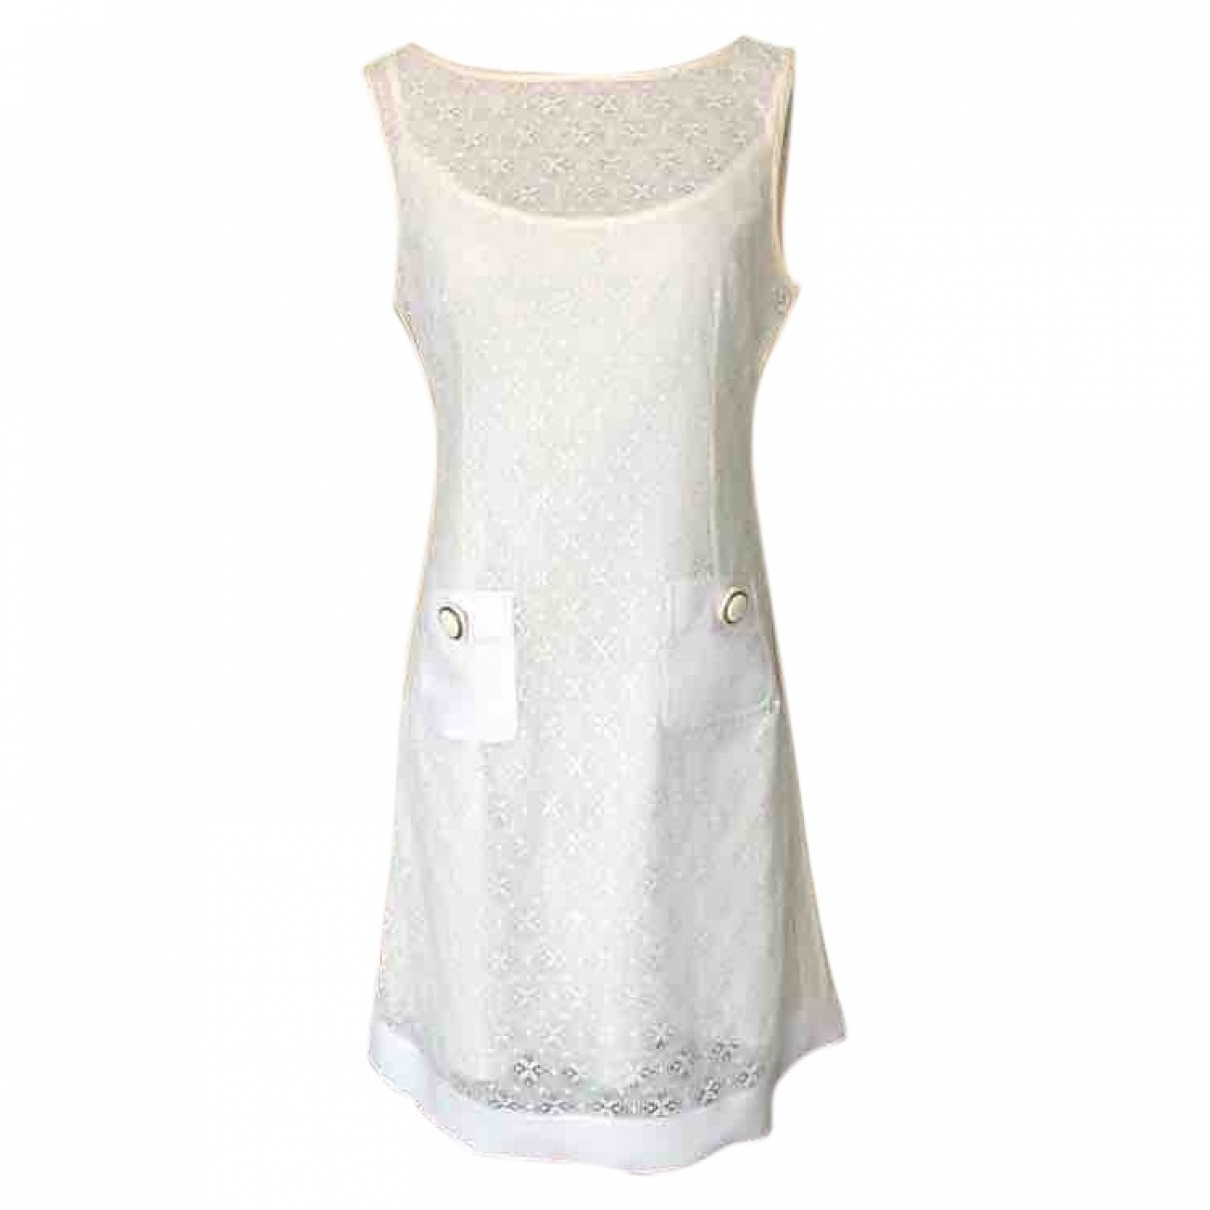 D&g \N White Cotton dress for Women 40 IT